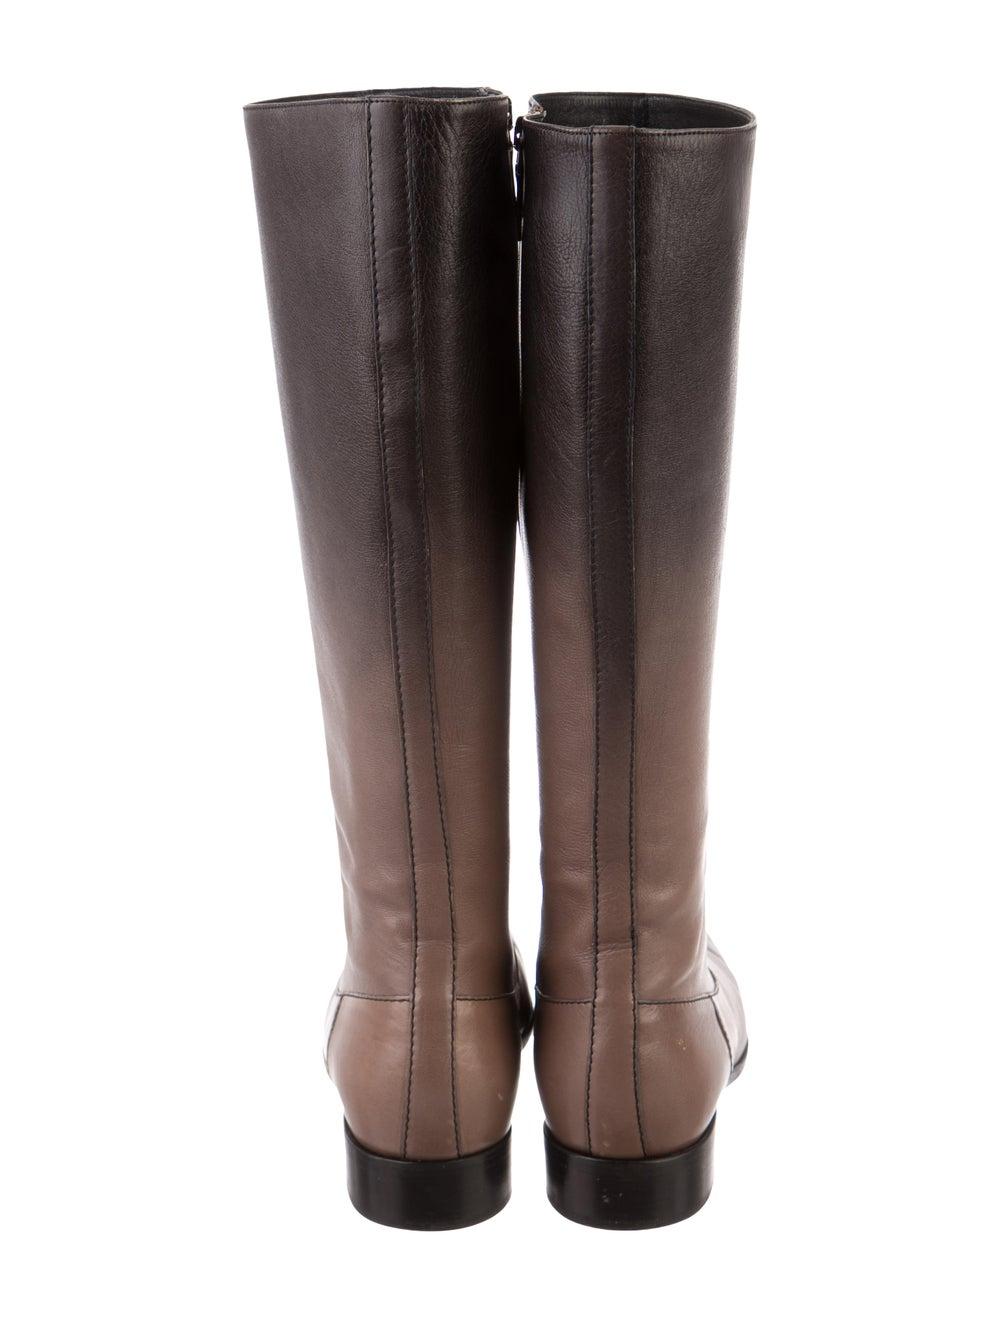 Prada Leather Knee-High Boots Brown - image 4